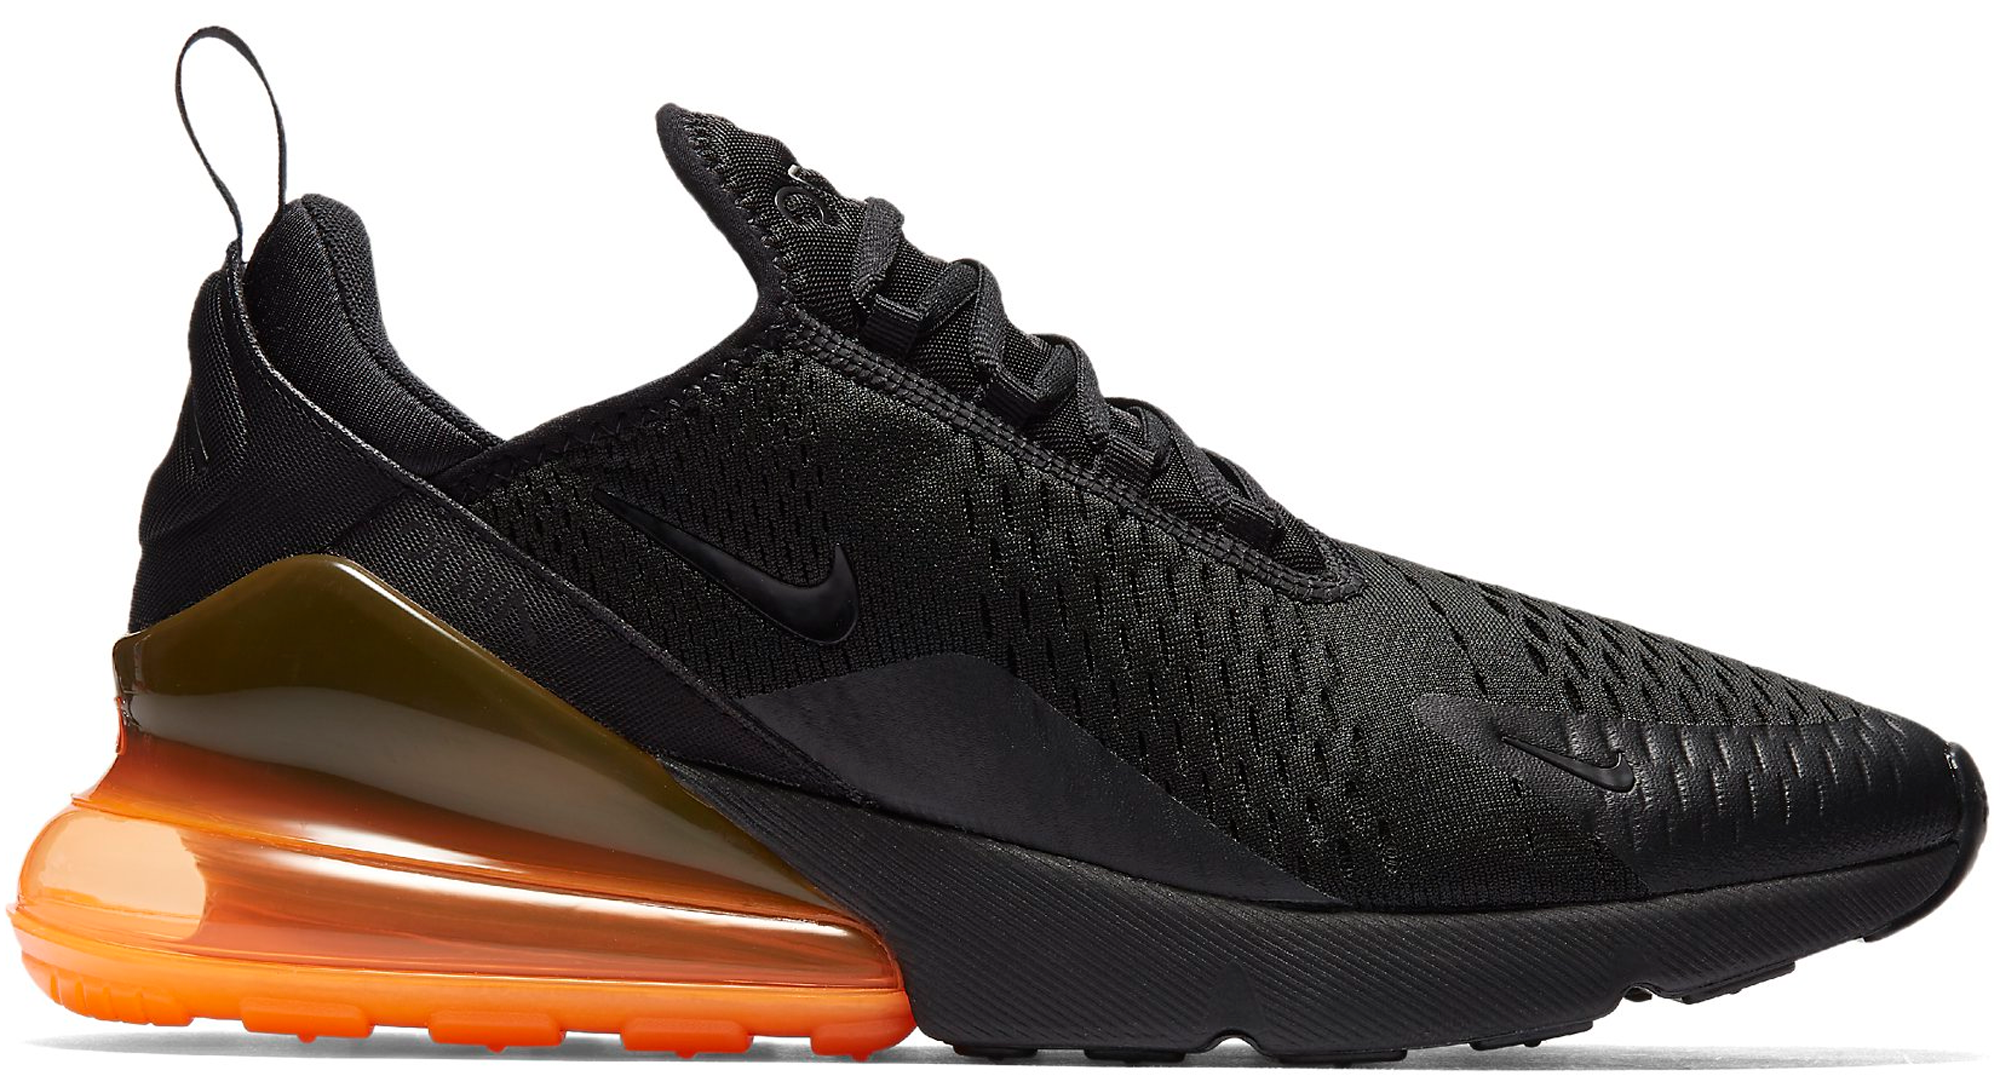 Nike Air Max 270 Black Total Orange - StockX News